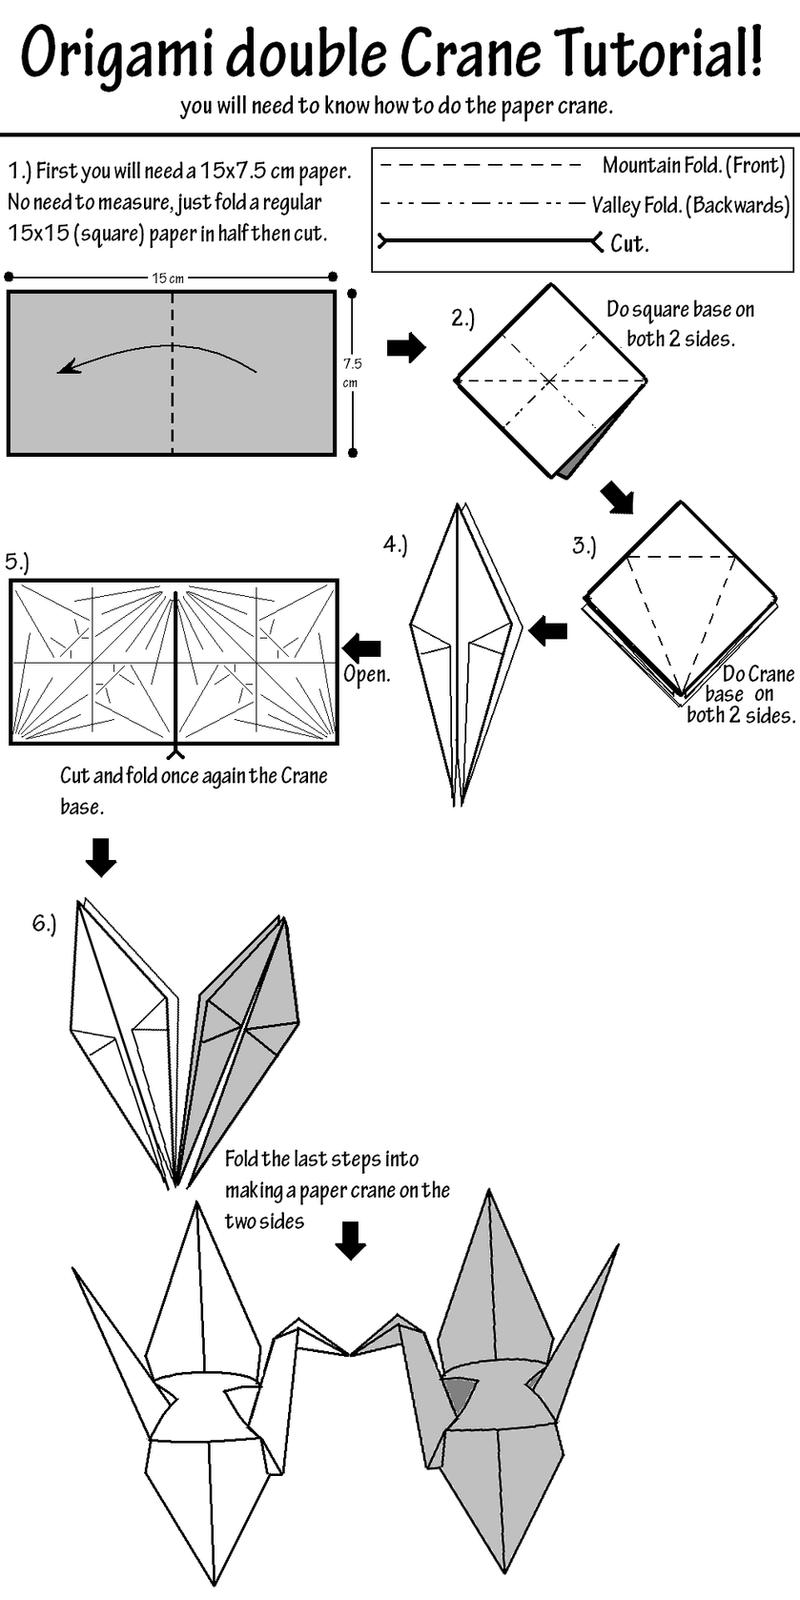 Origami kissing crane tutorial by salvare0zero0 on deviantart for Crane tutorial